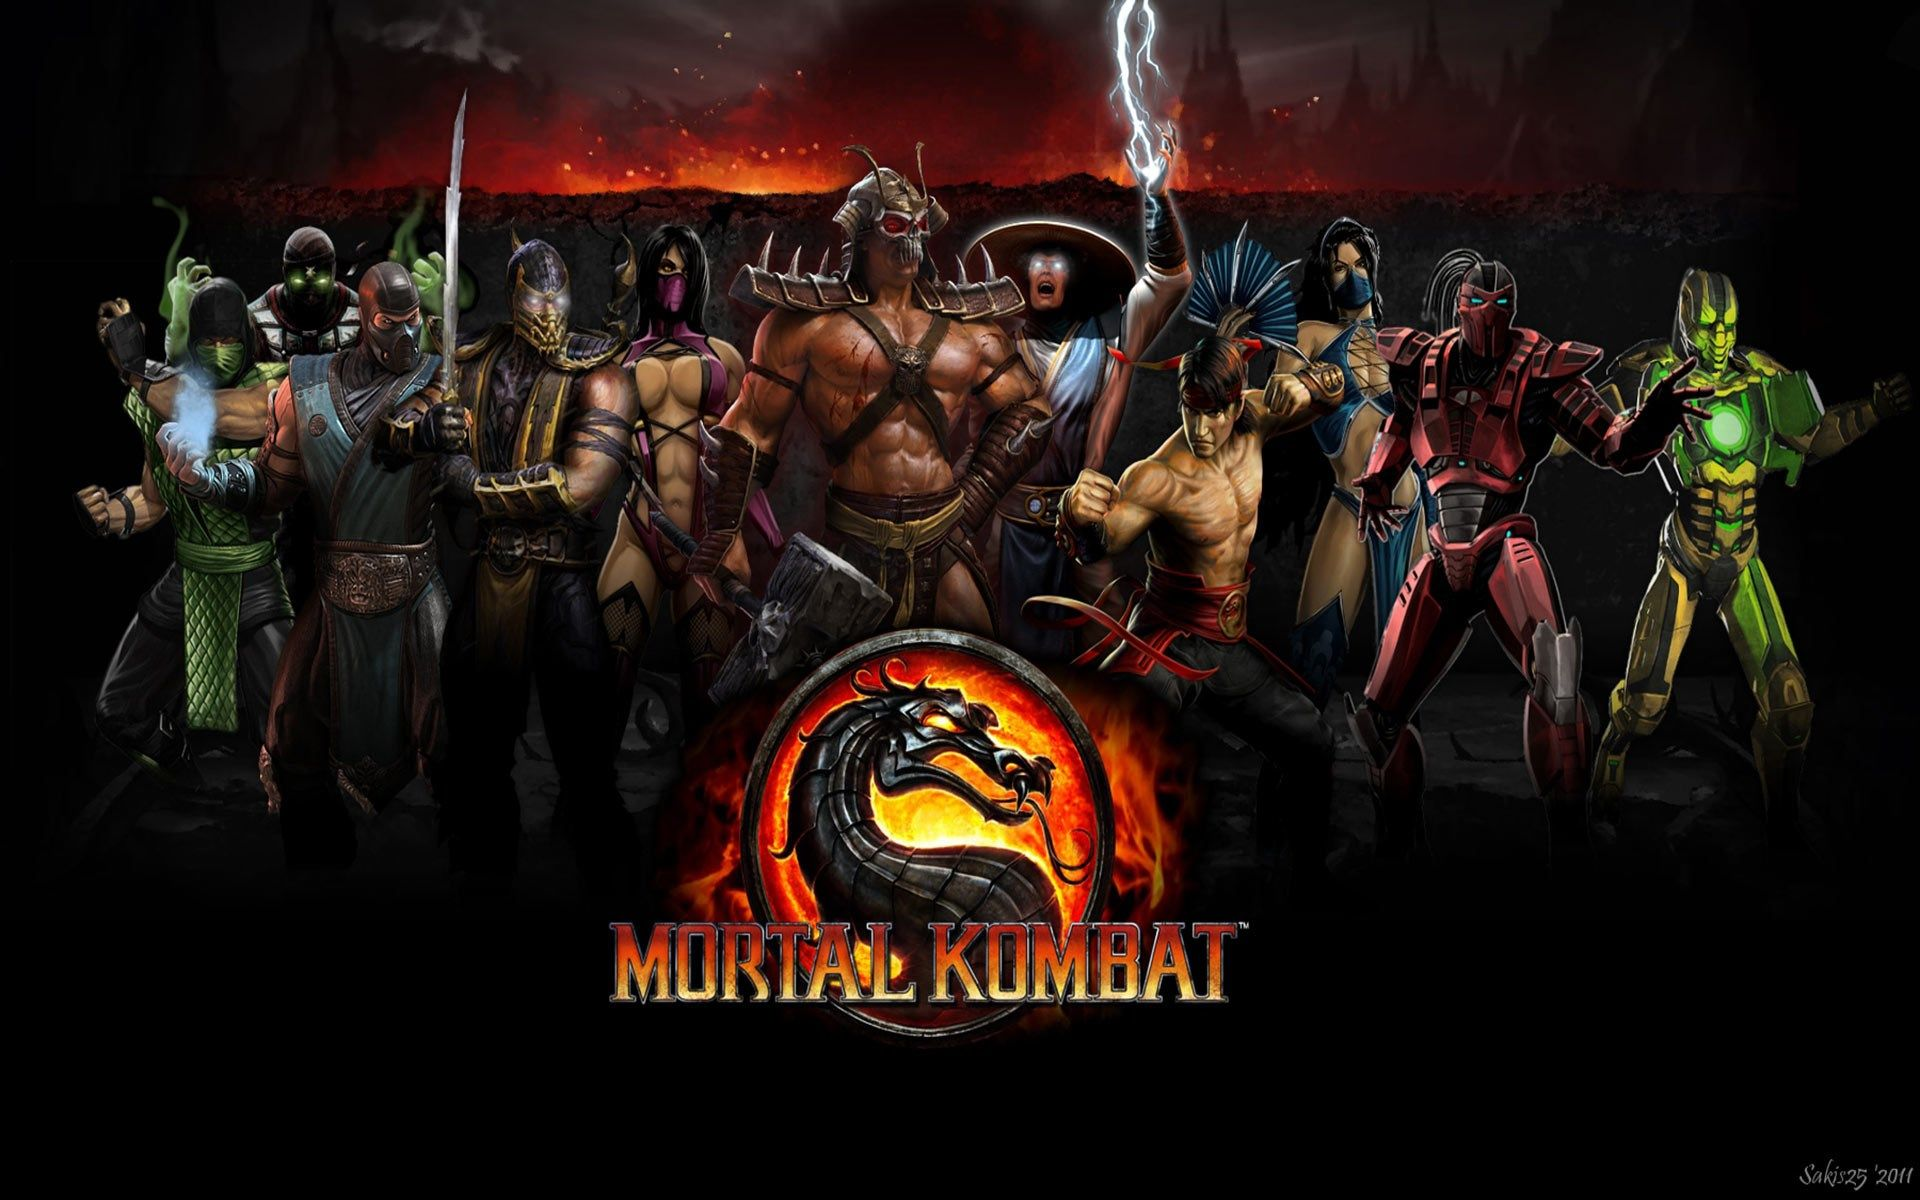 Mortal Kombat Screensavers And Backgrounds Free Mortal Kombat Character Wallpaper Art Wallpaper